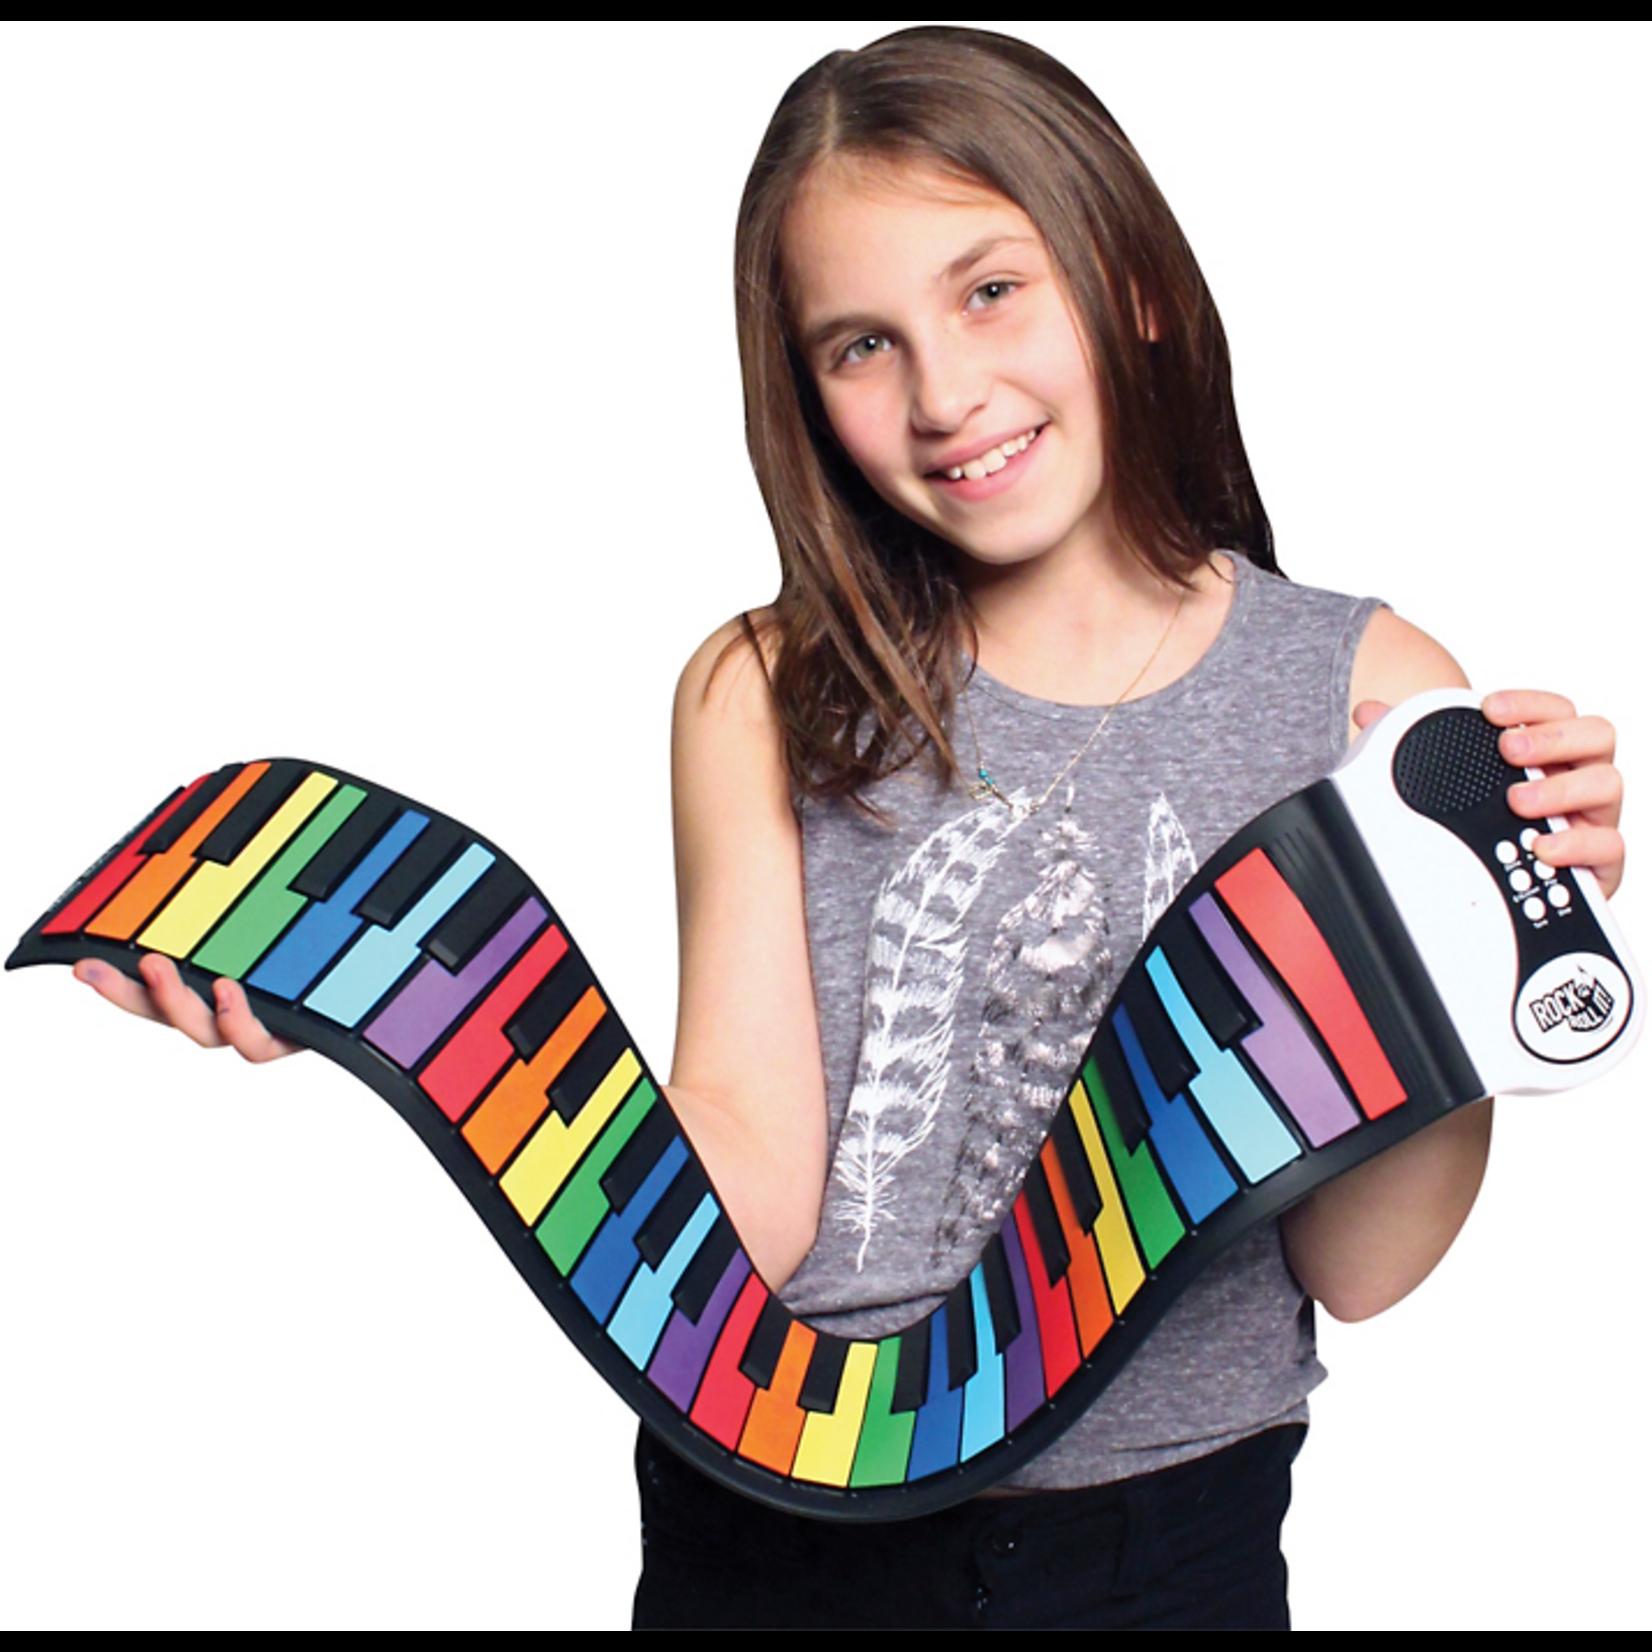 MUKIKIM ROCK N ROLL IT - PIANO